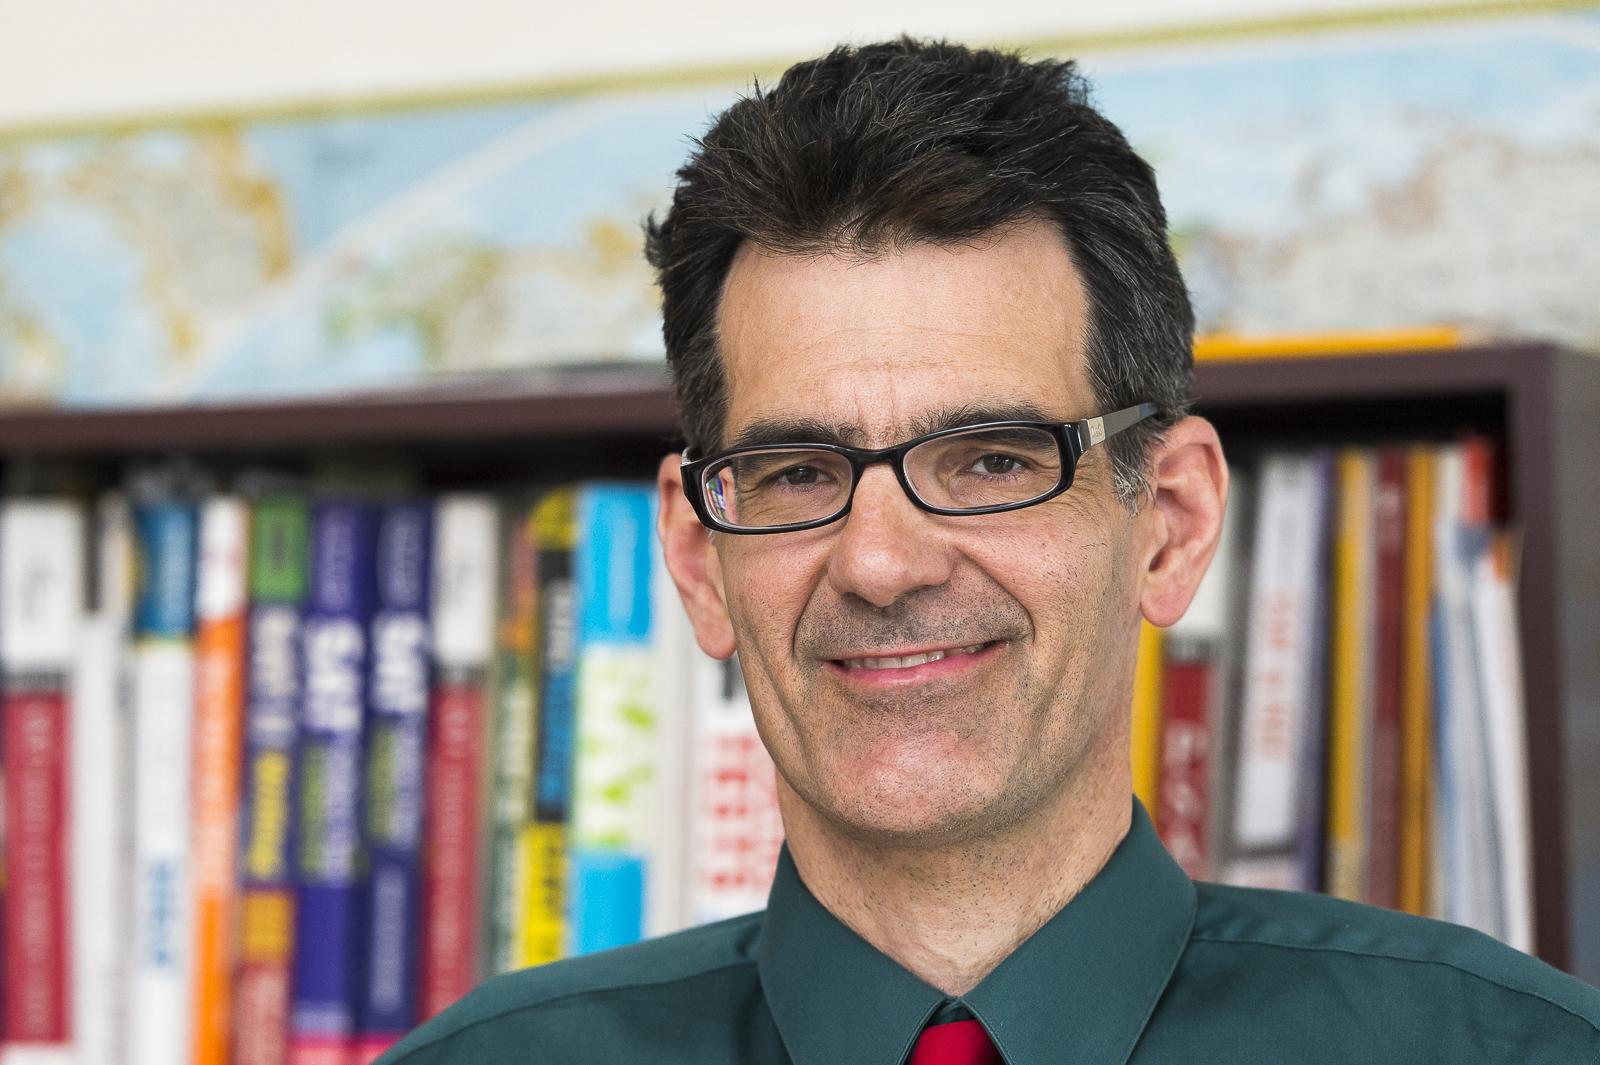 Mr. David Dunlop    Educator